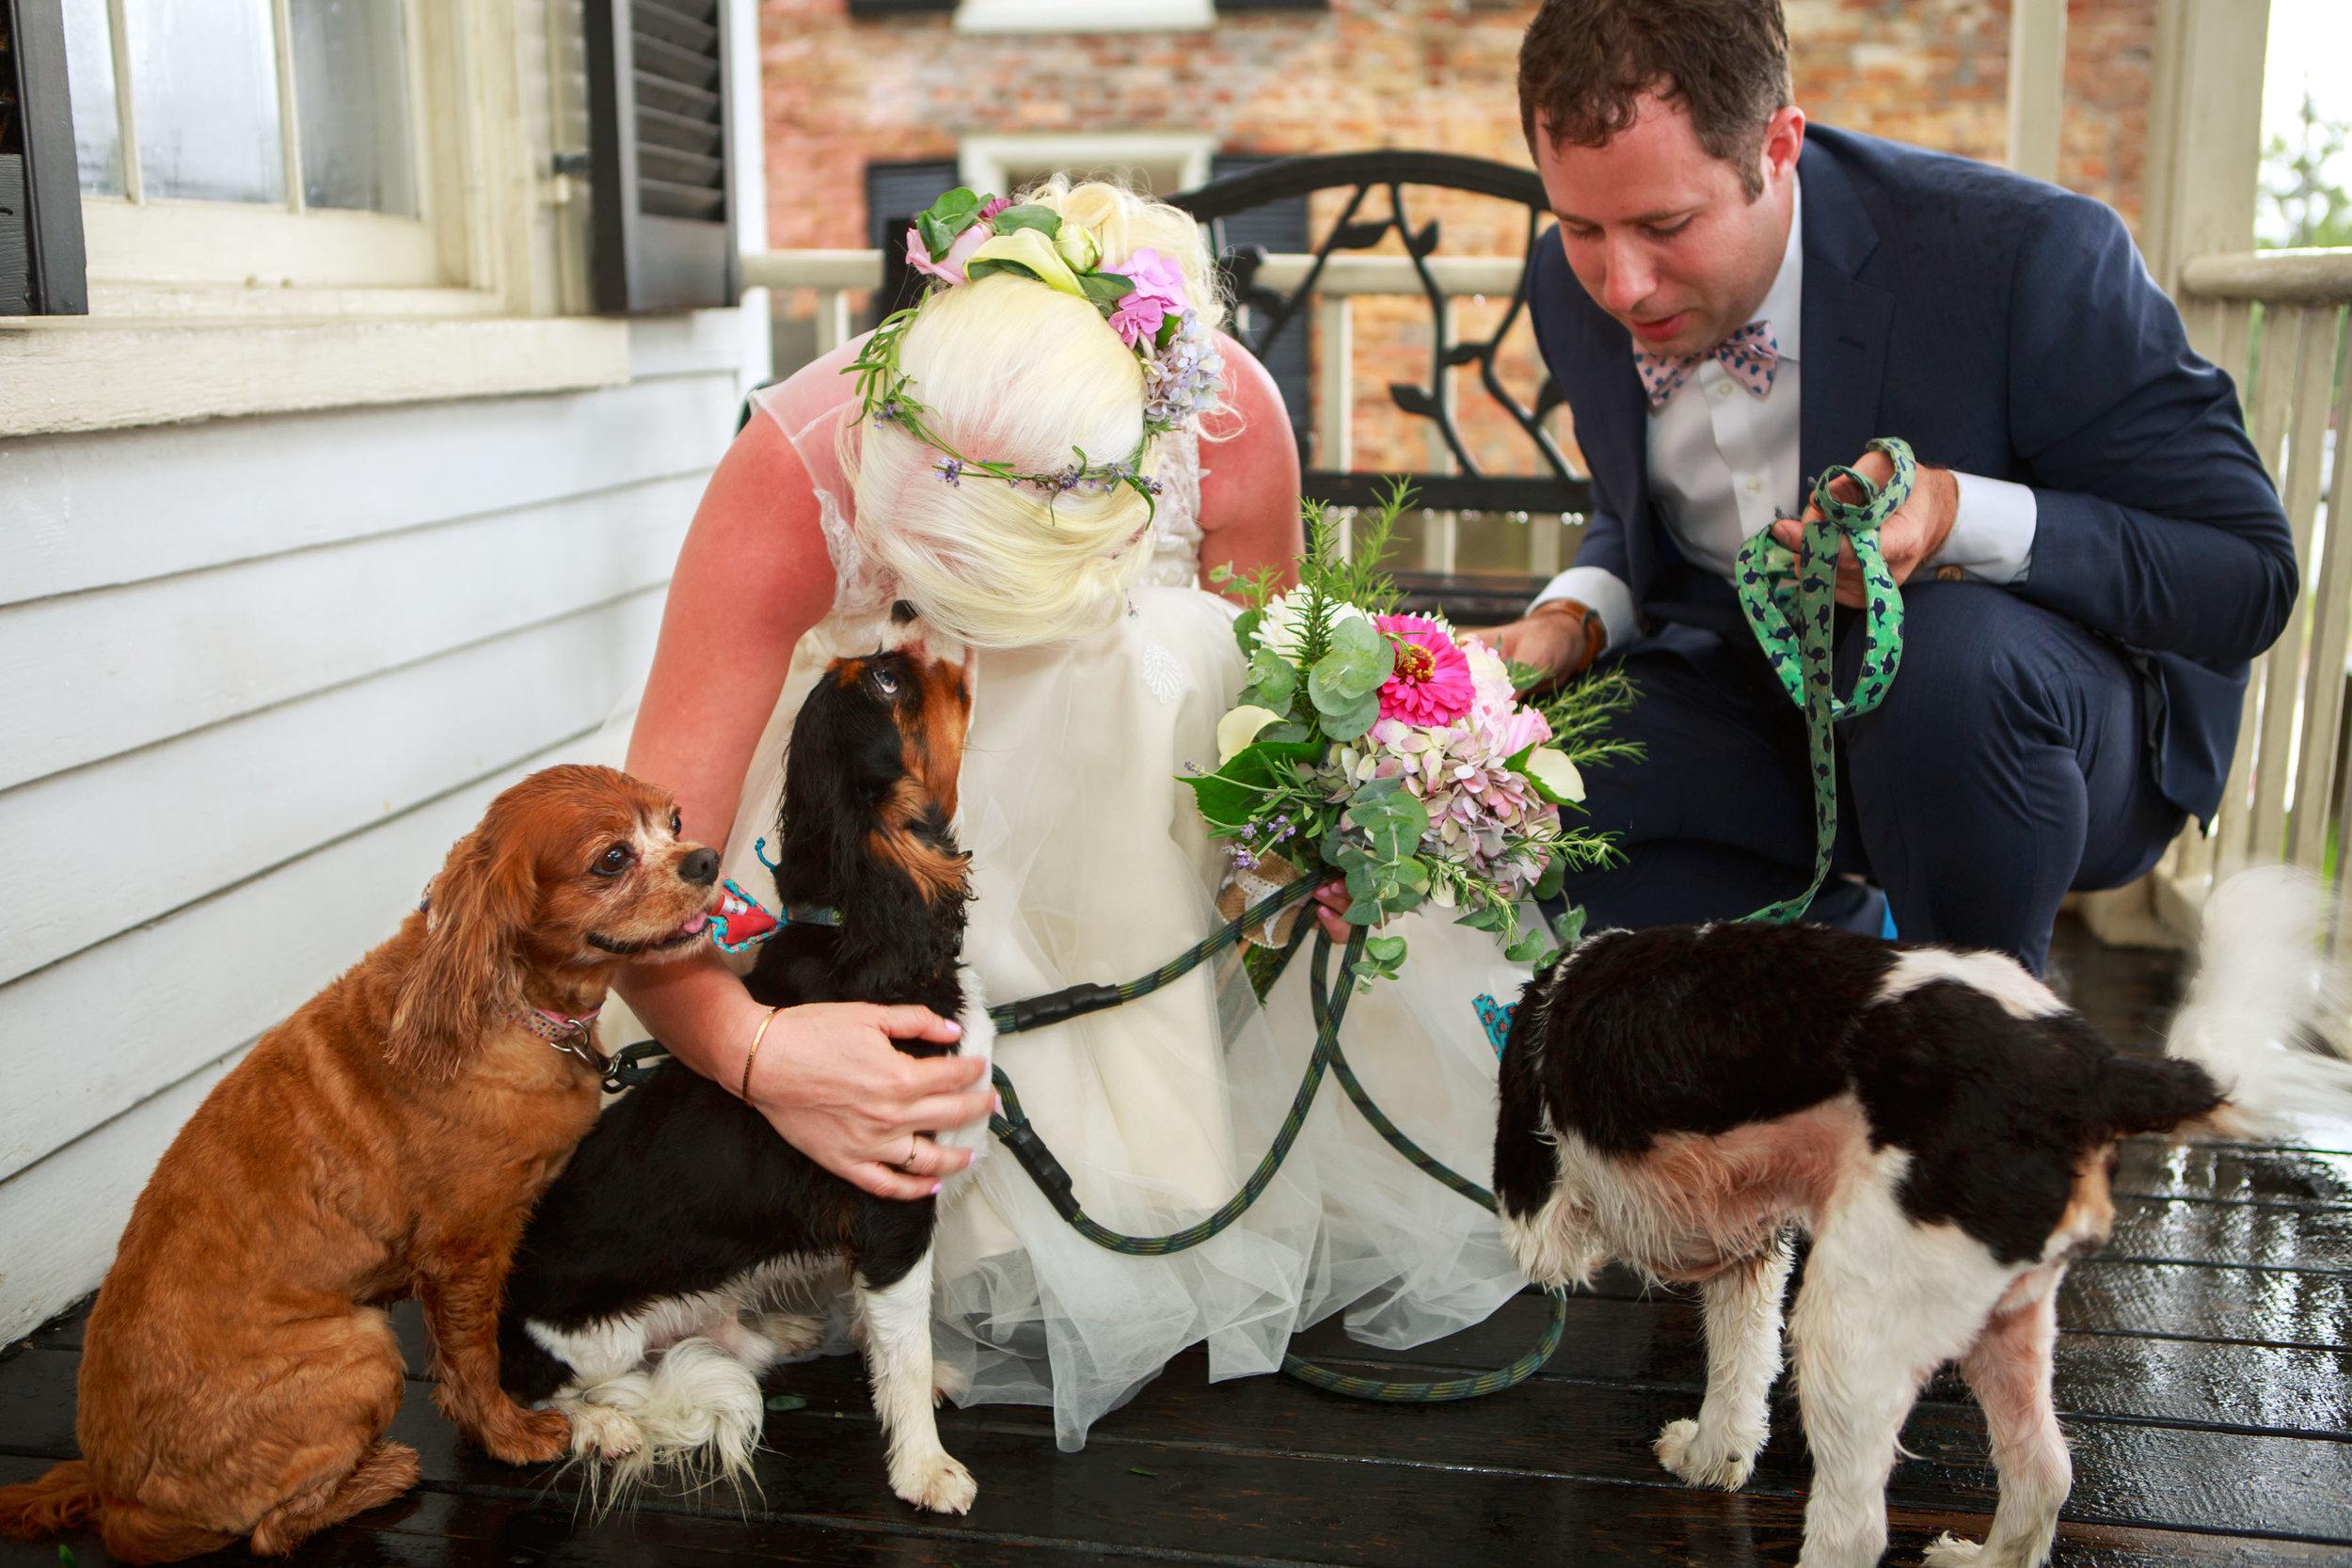 128-South-Wedding-Tiffany-Abruzzo-Photography-First-Look-18.jpg